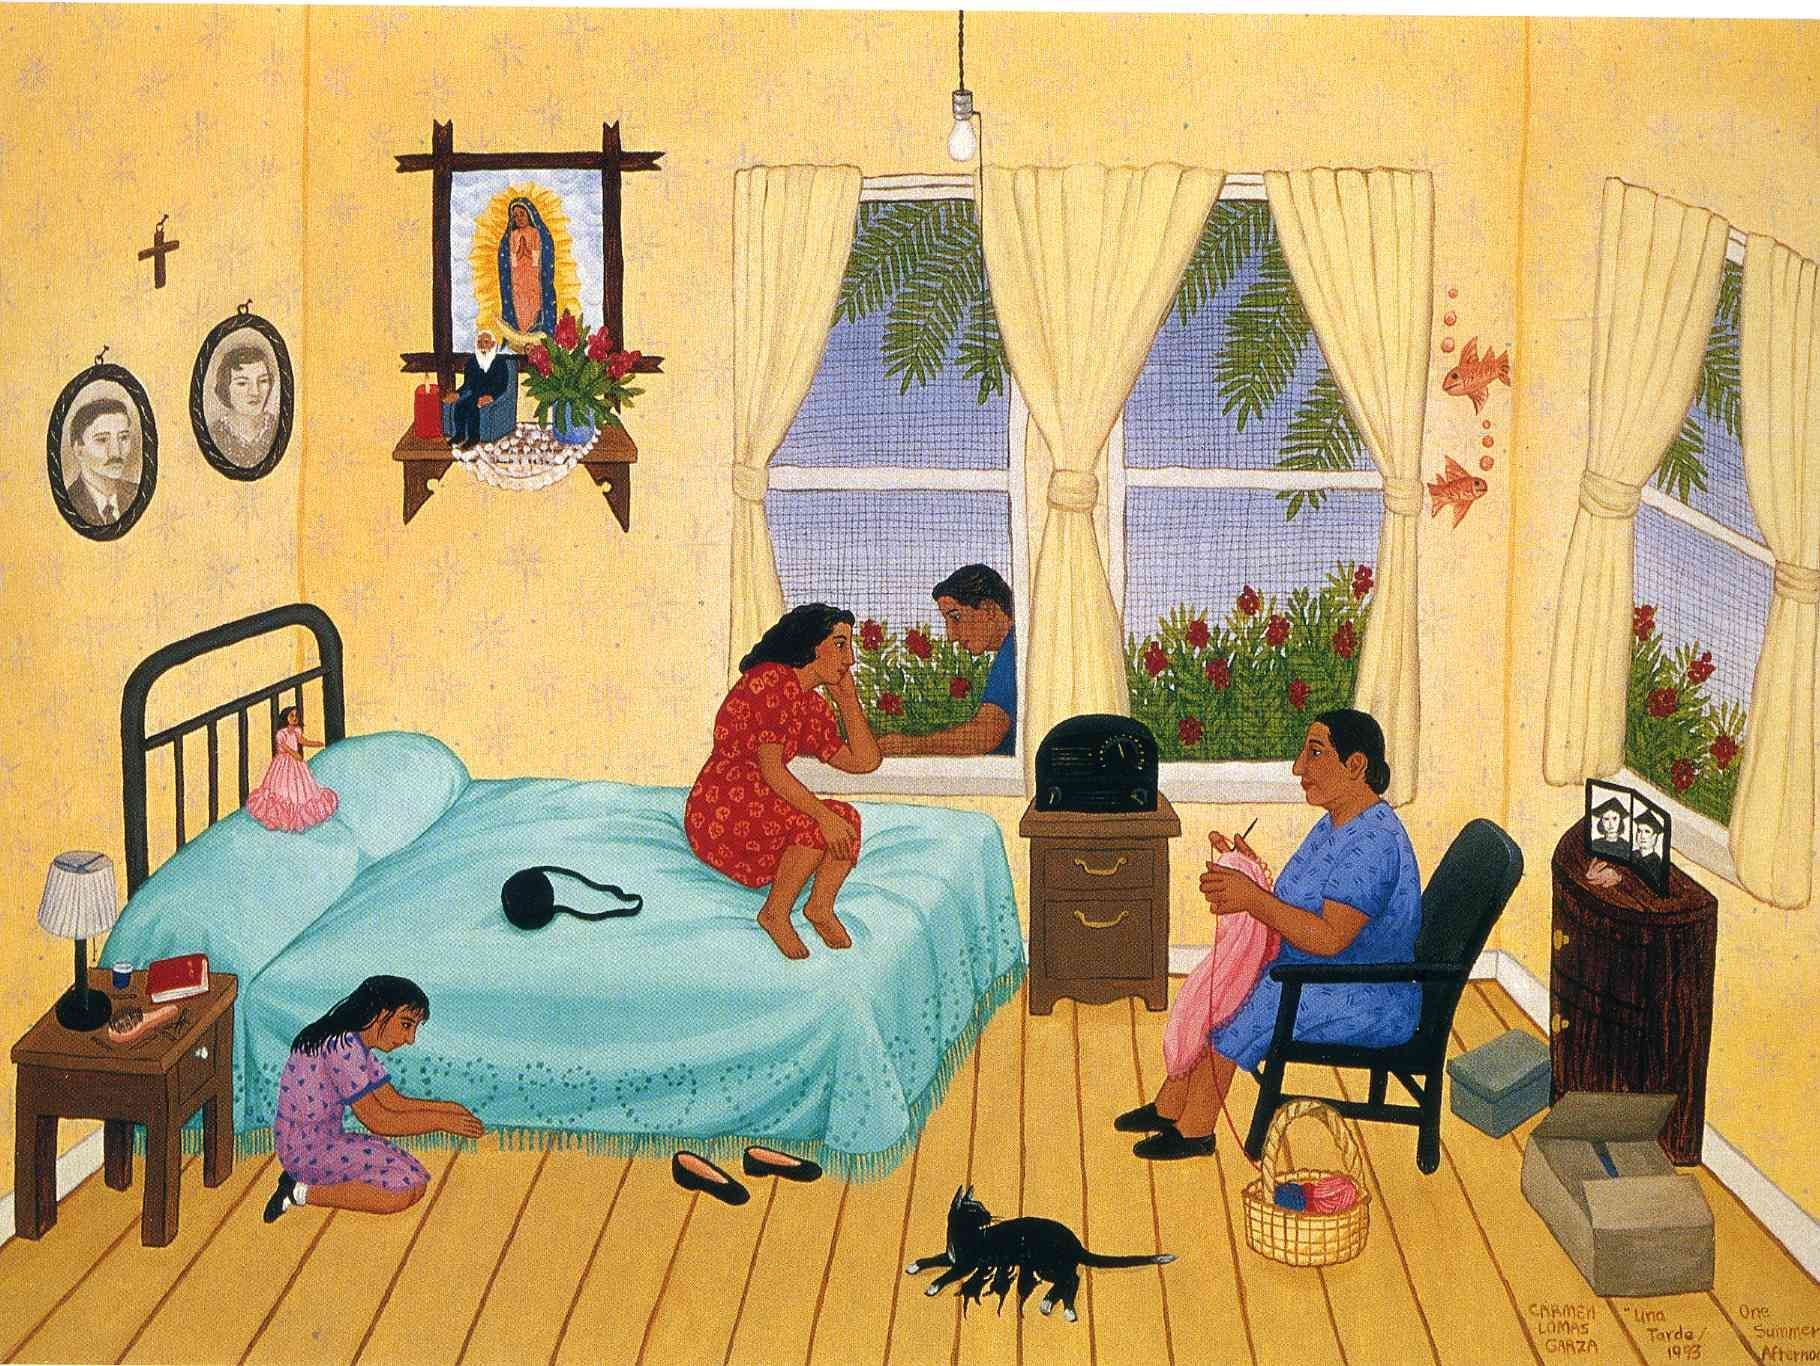 62 best images about Art/Carmen Lomas Garza on Pinterest | Mexican ...